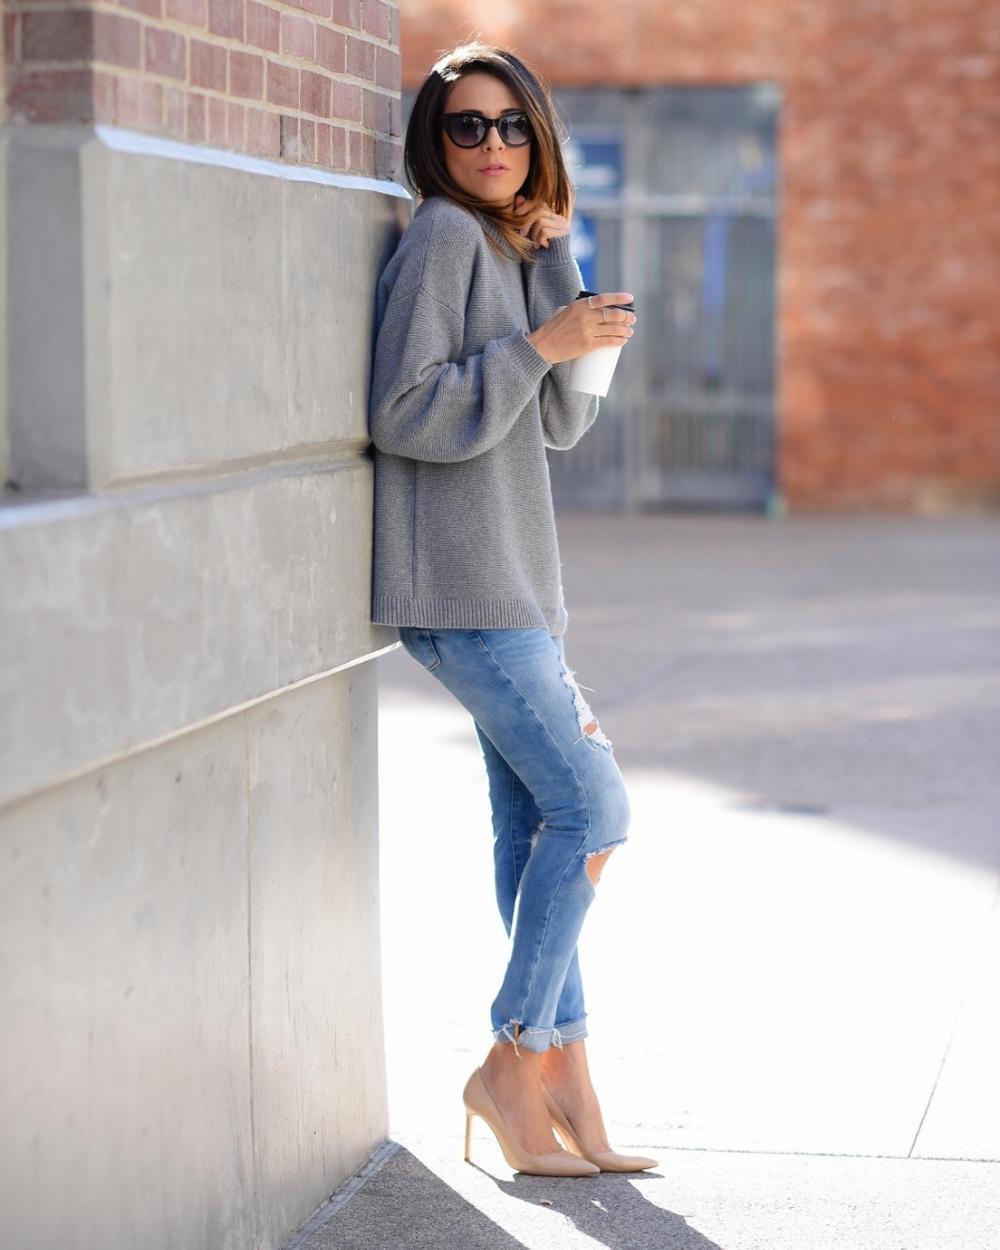 SimplyKasia_CustomJewelry_SanDiego_Fashion_FashionBlogger_LucysWhims_Streetstyle_BananaRepublic_BlankNYC.jpg